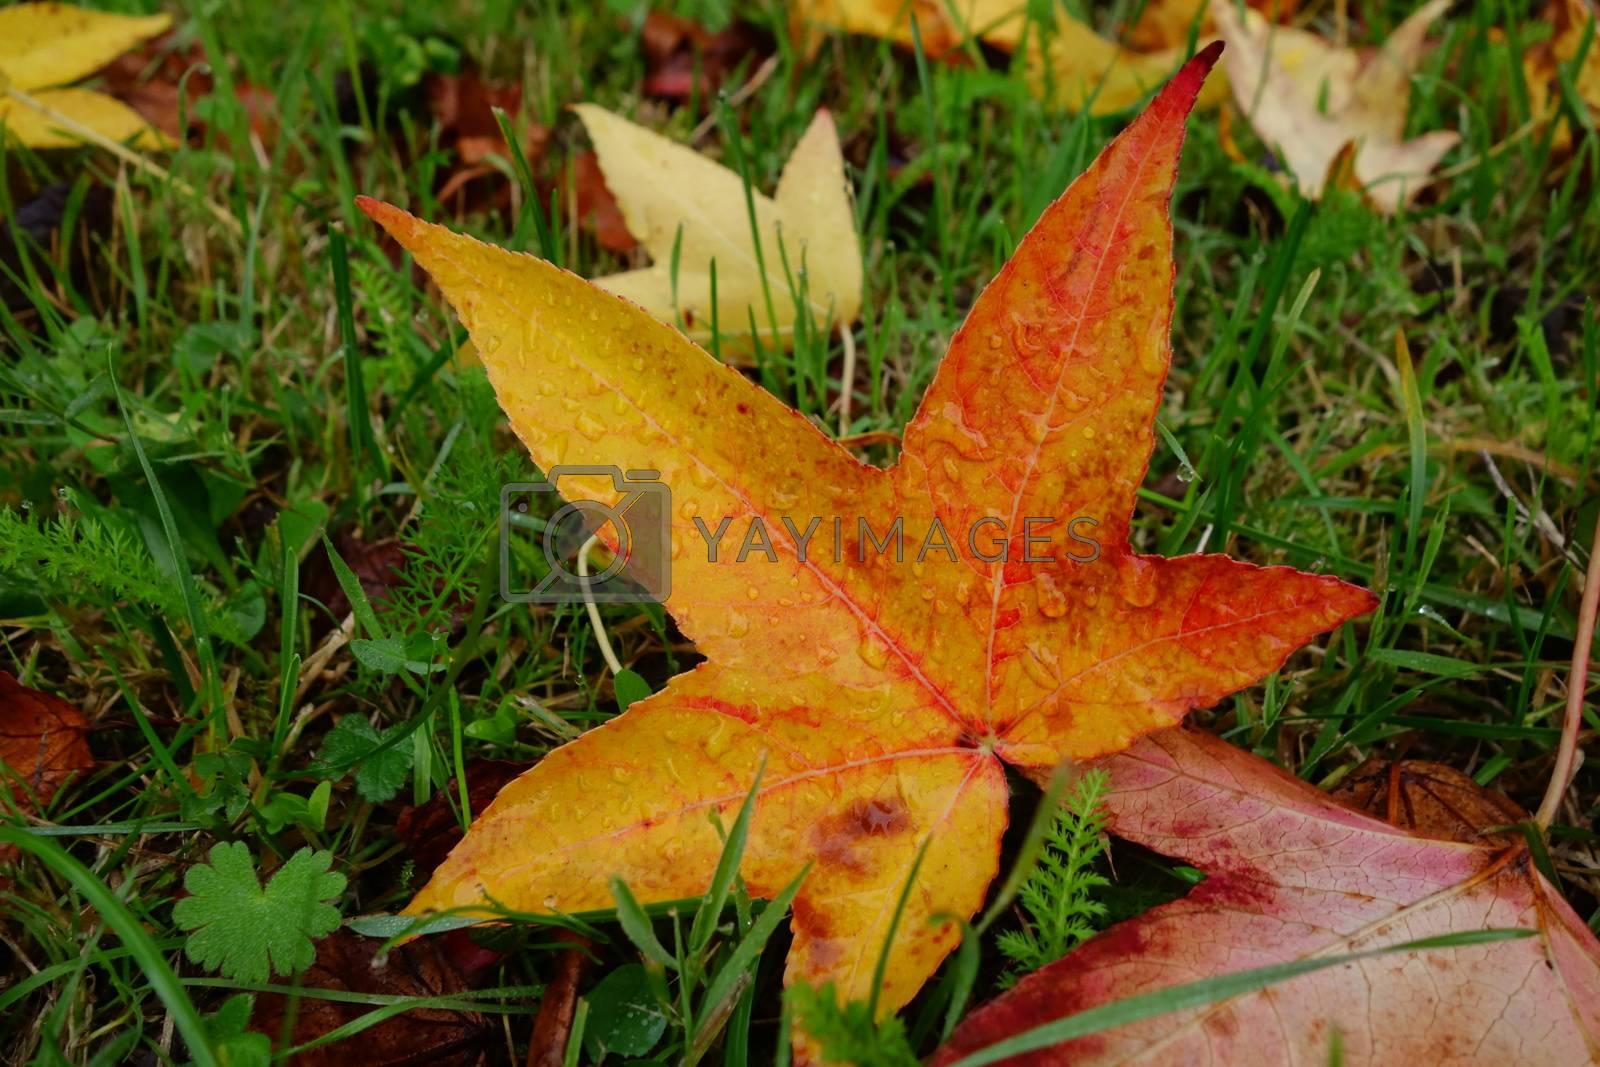 Sweet Gum Leaf by James53145